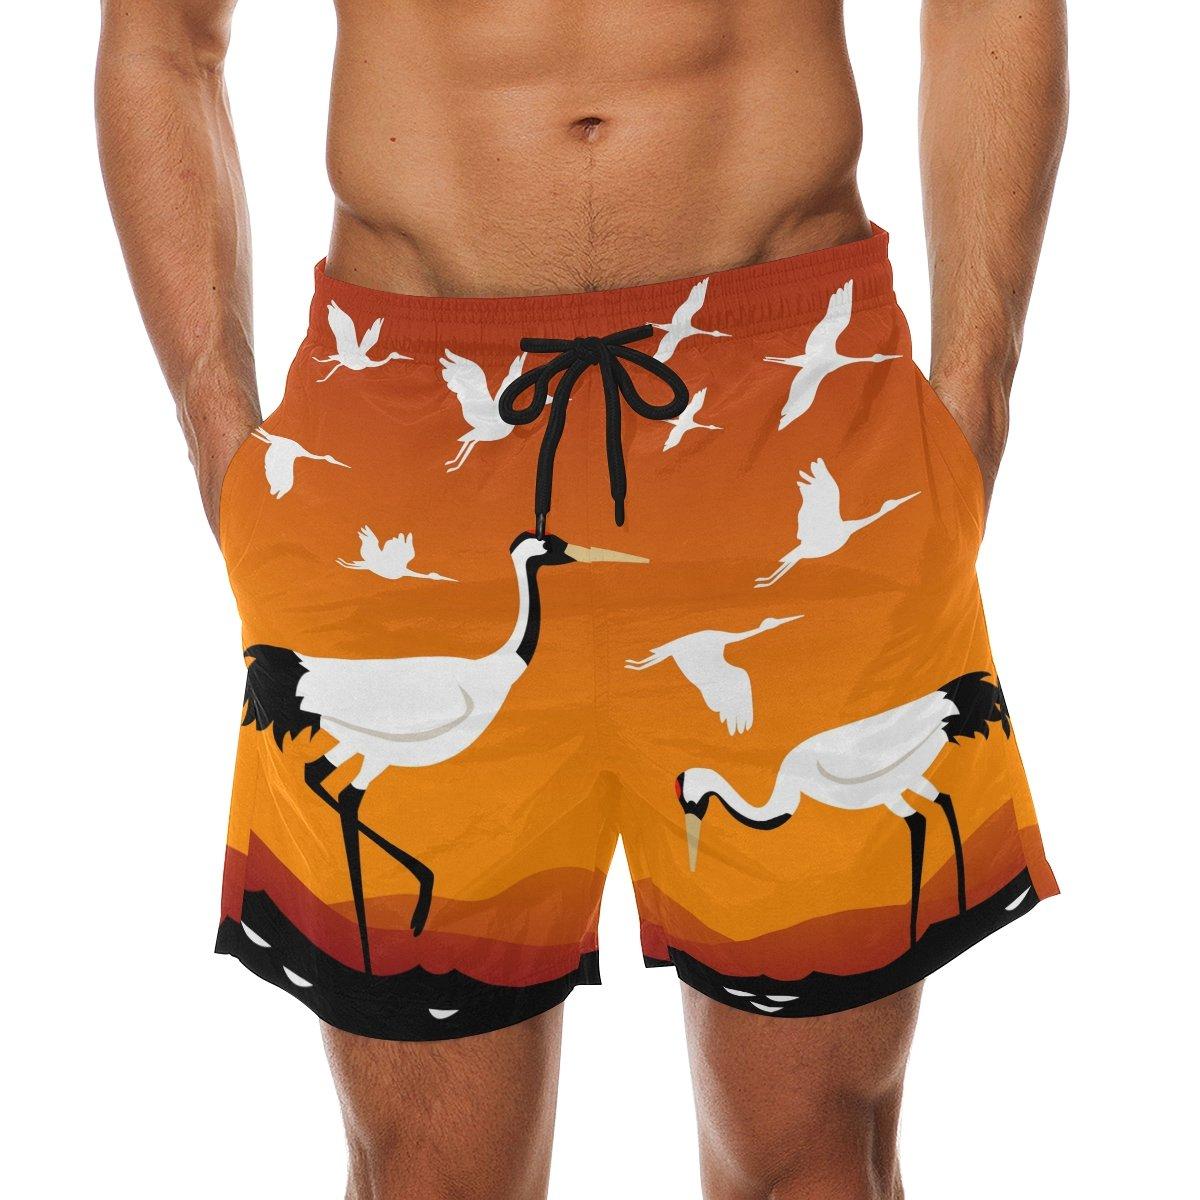 LORVIES Mens Flying Cranes Beach Board Shorts Quick Dry Swim Trunk